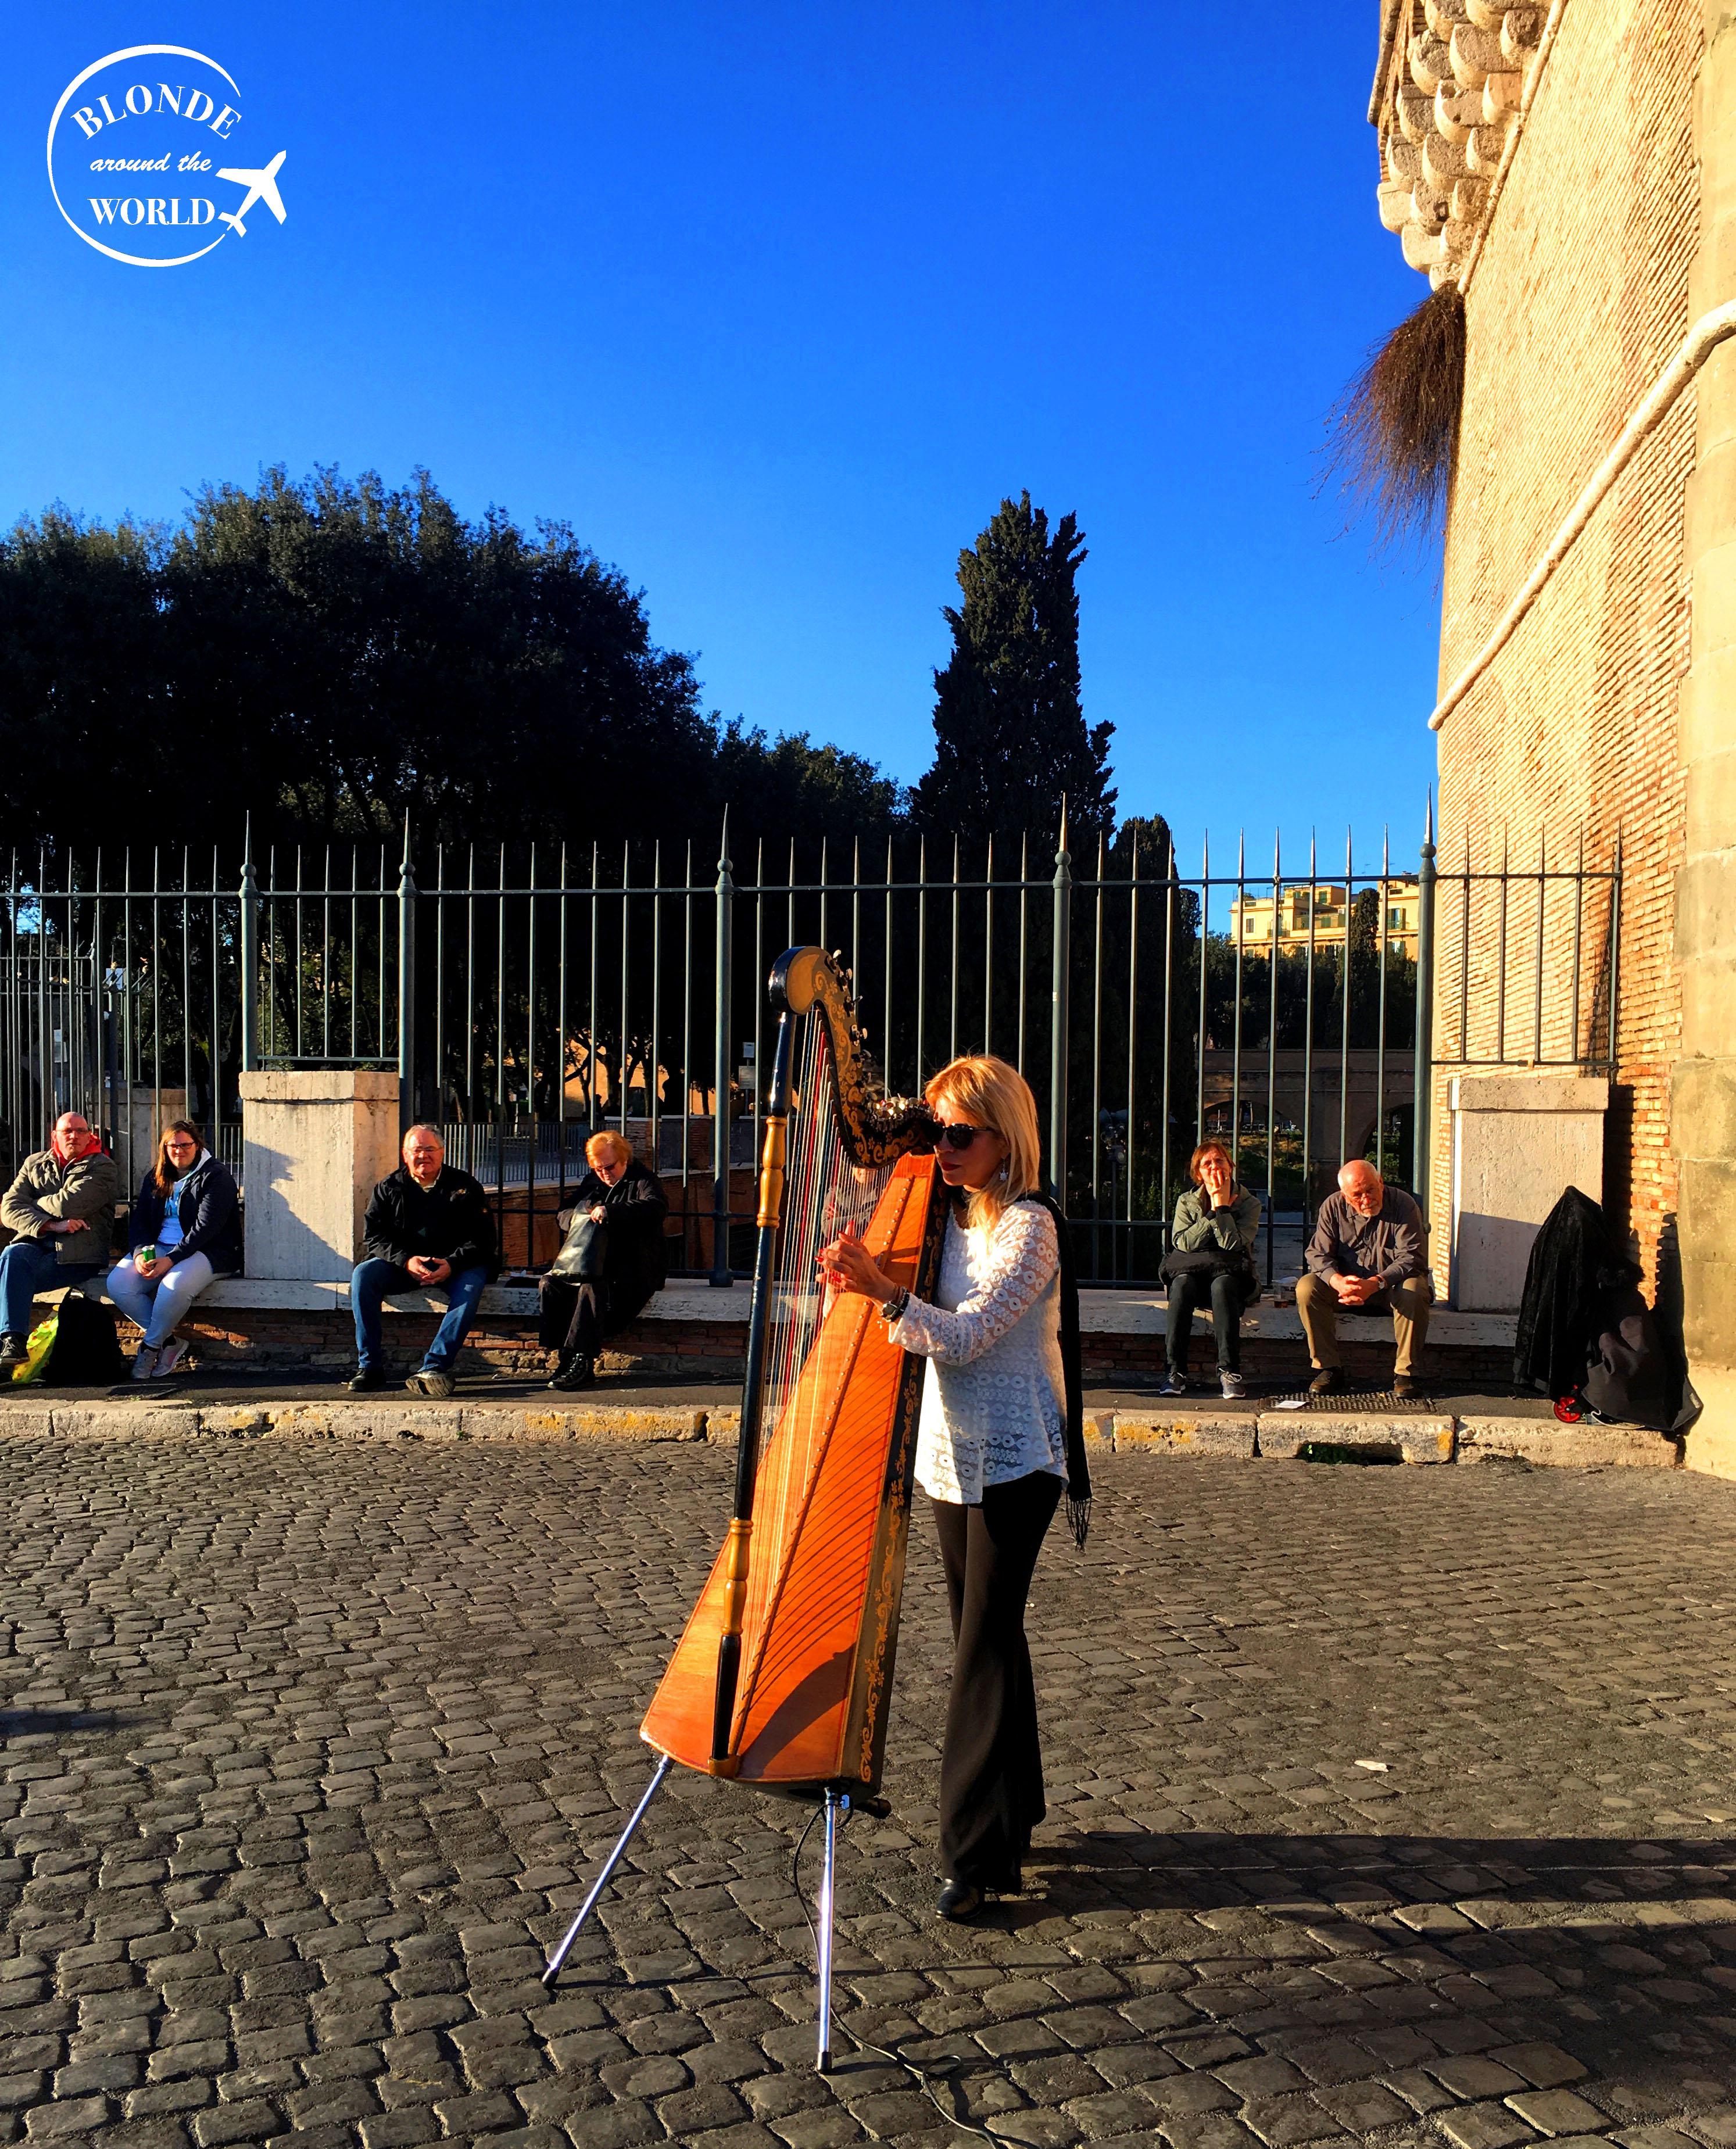 rome_streets_santangelo.jpg